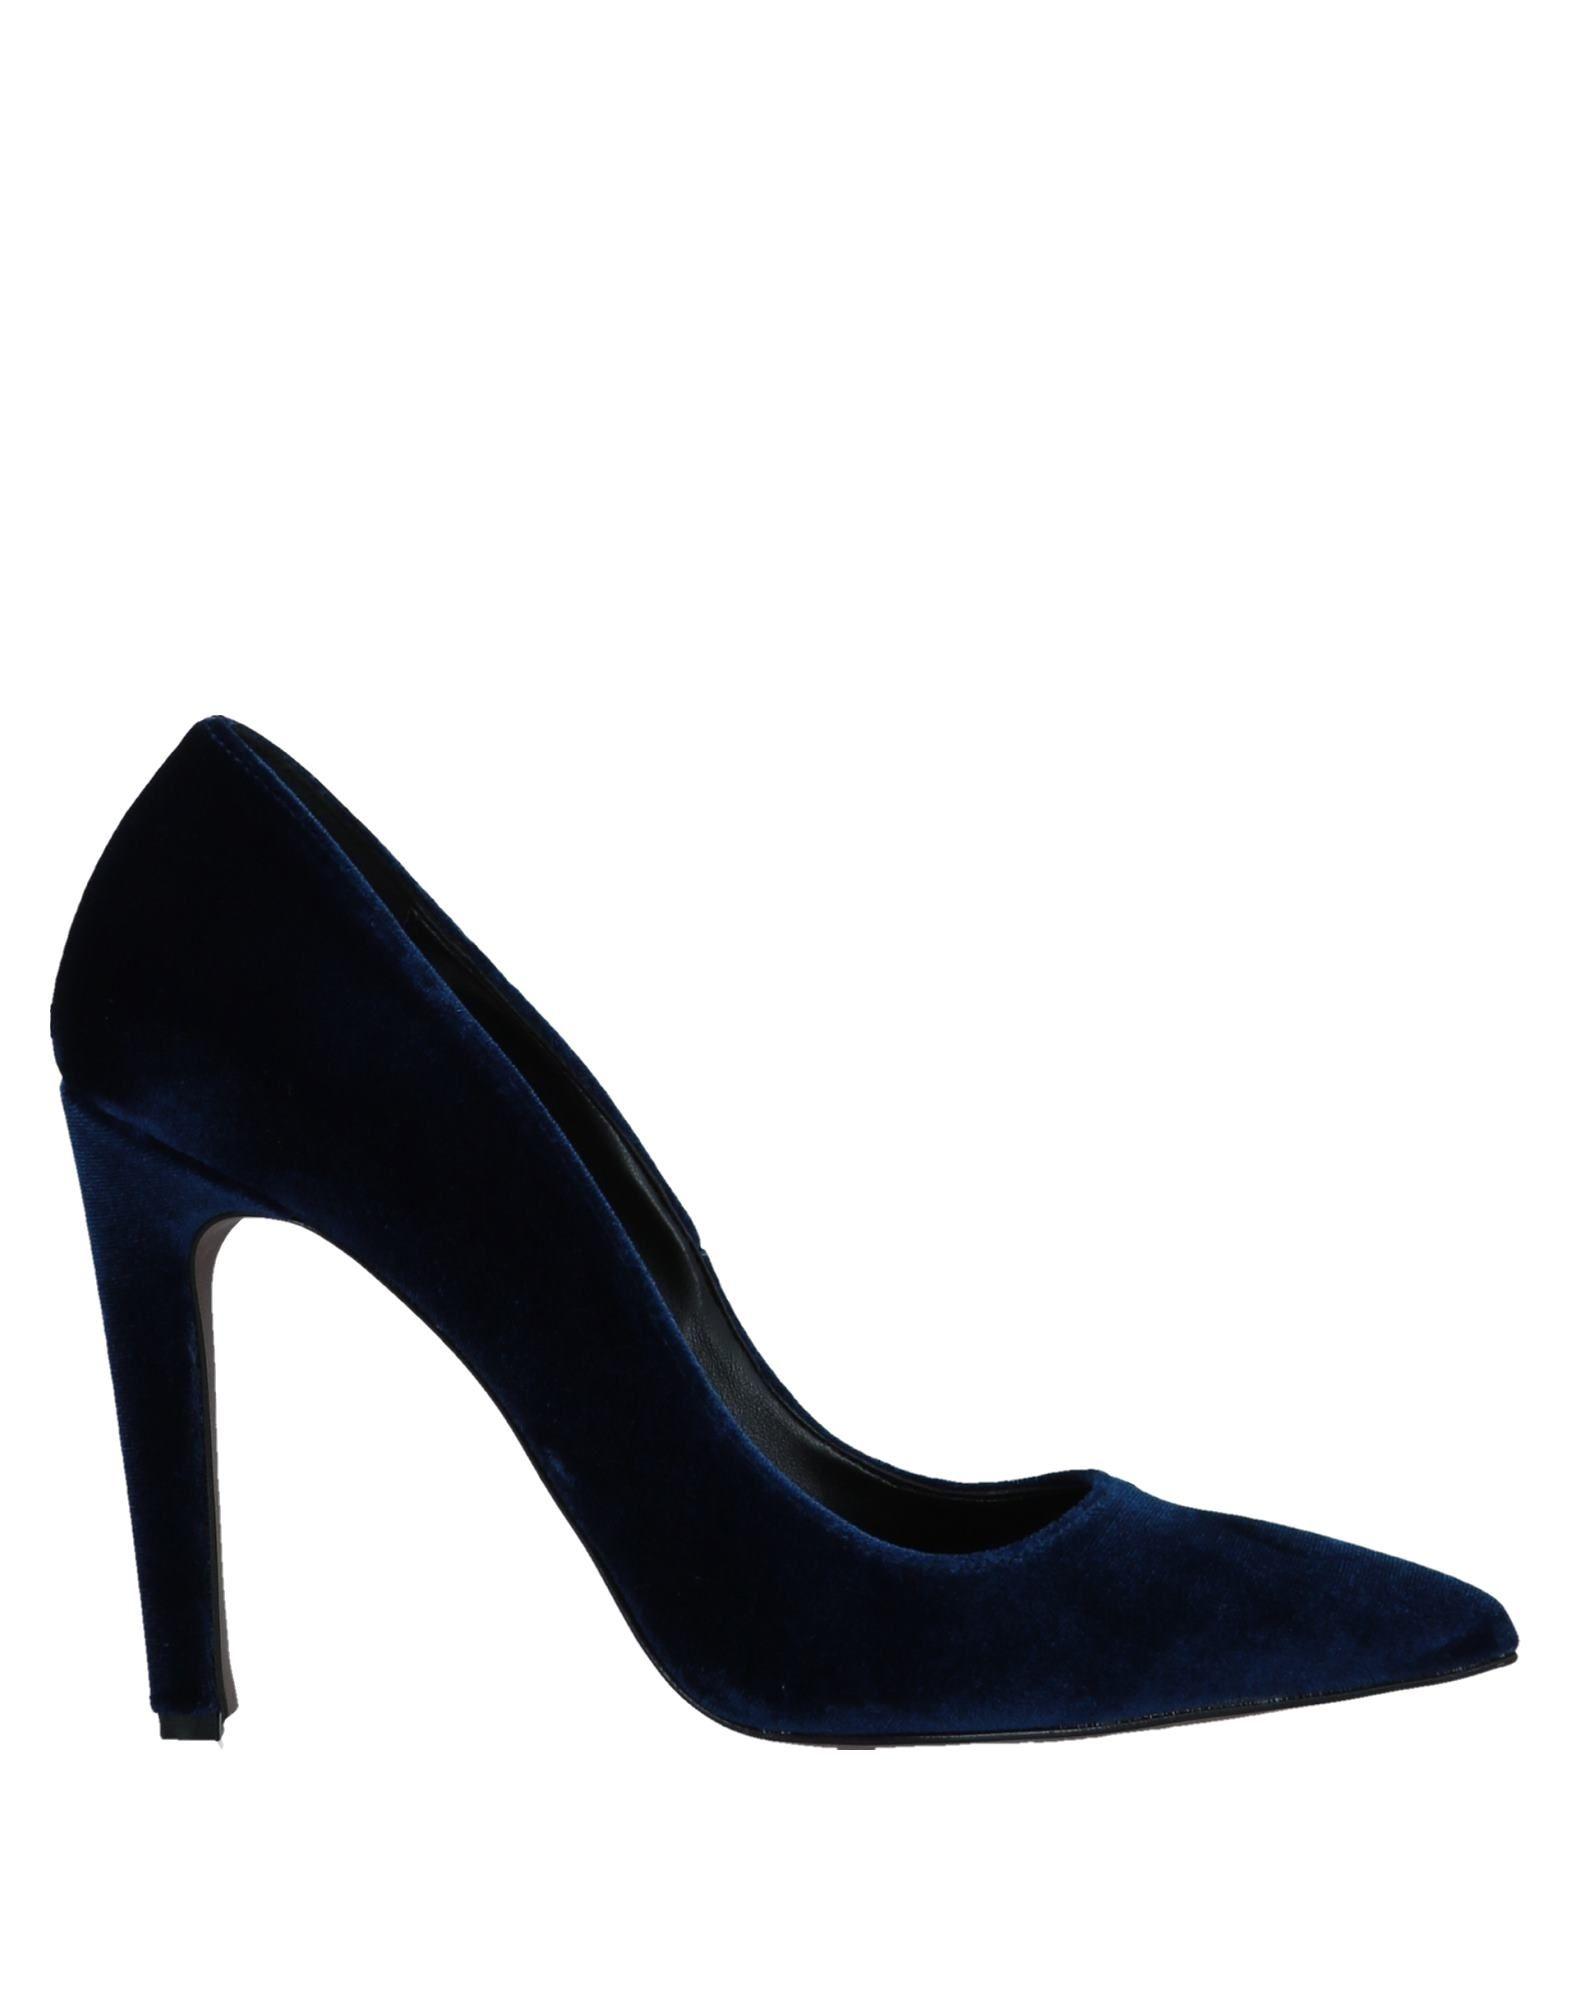 Sandali Kork-Ease Donna e - 11423305LM Nuove offerte e Donna scarpe comode f7bb1d